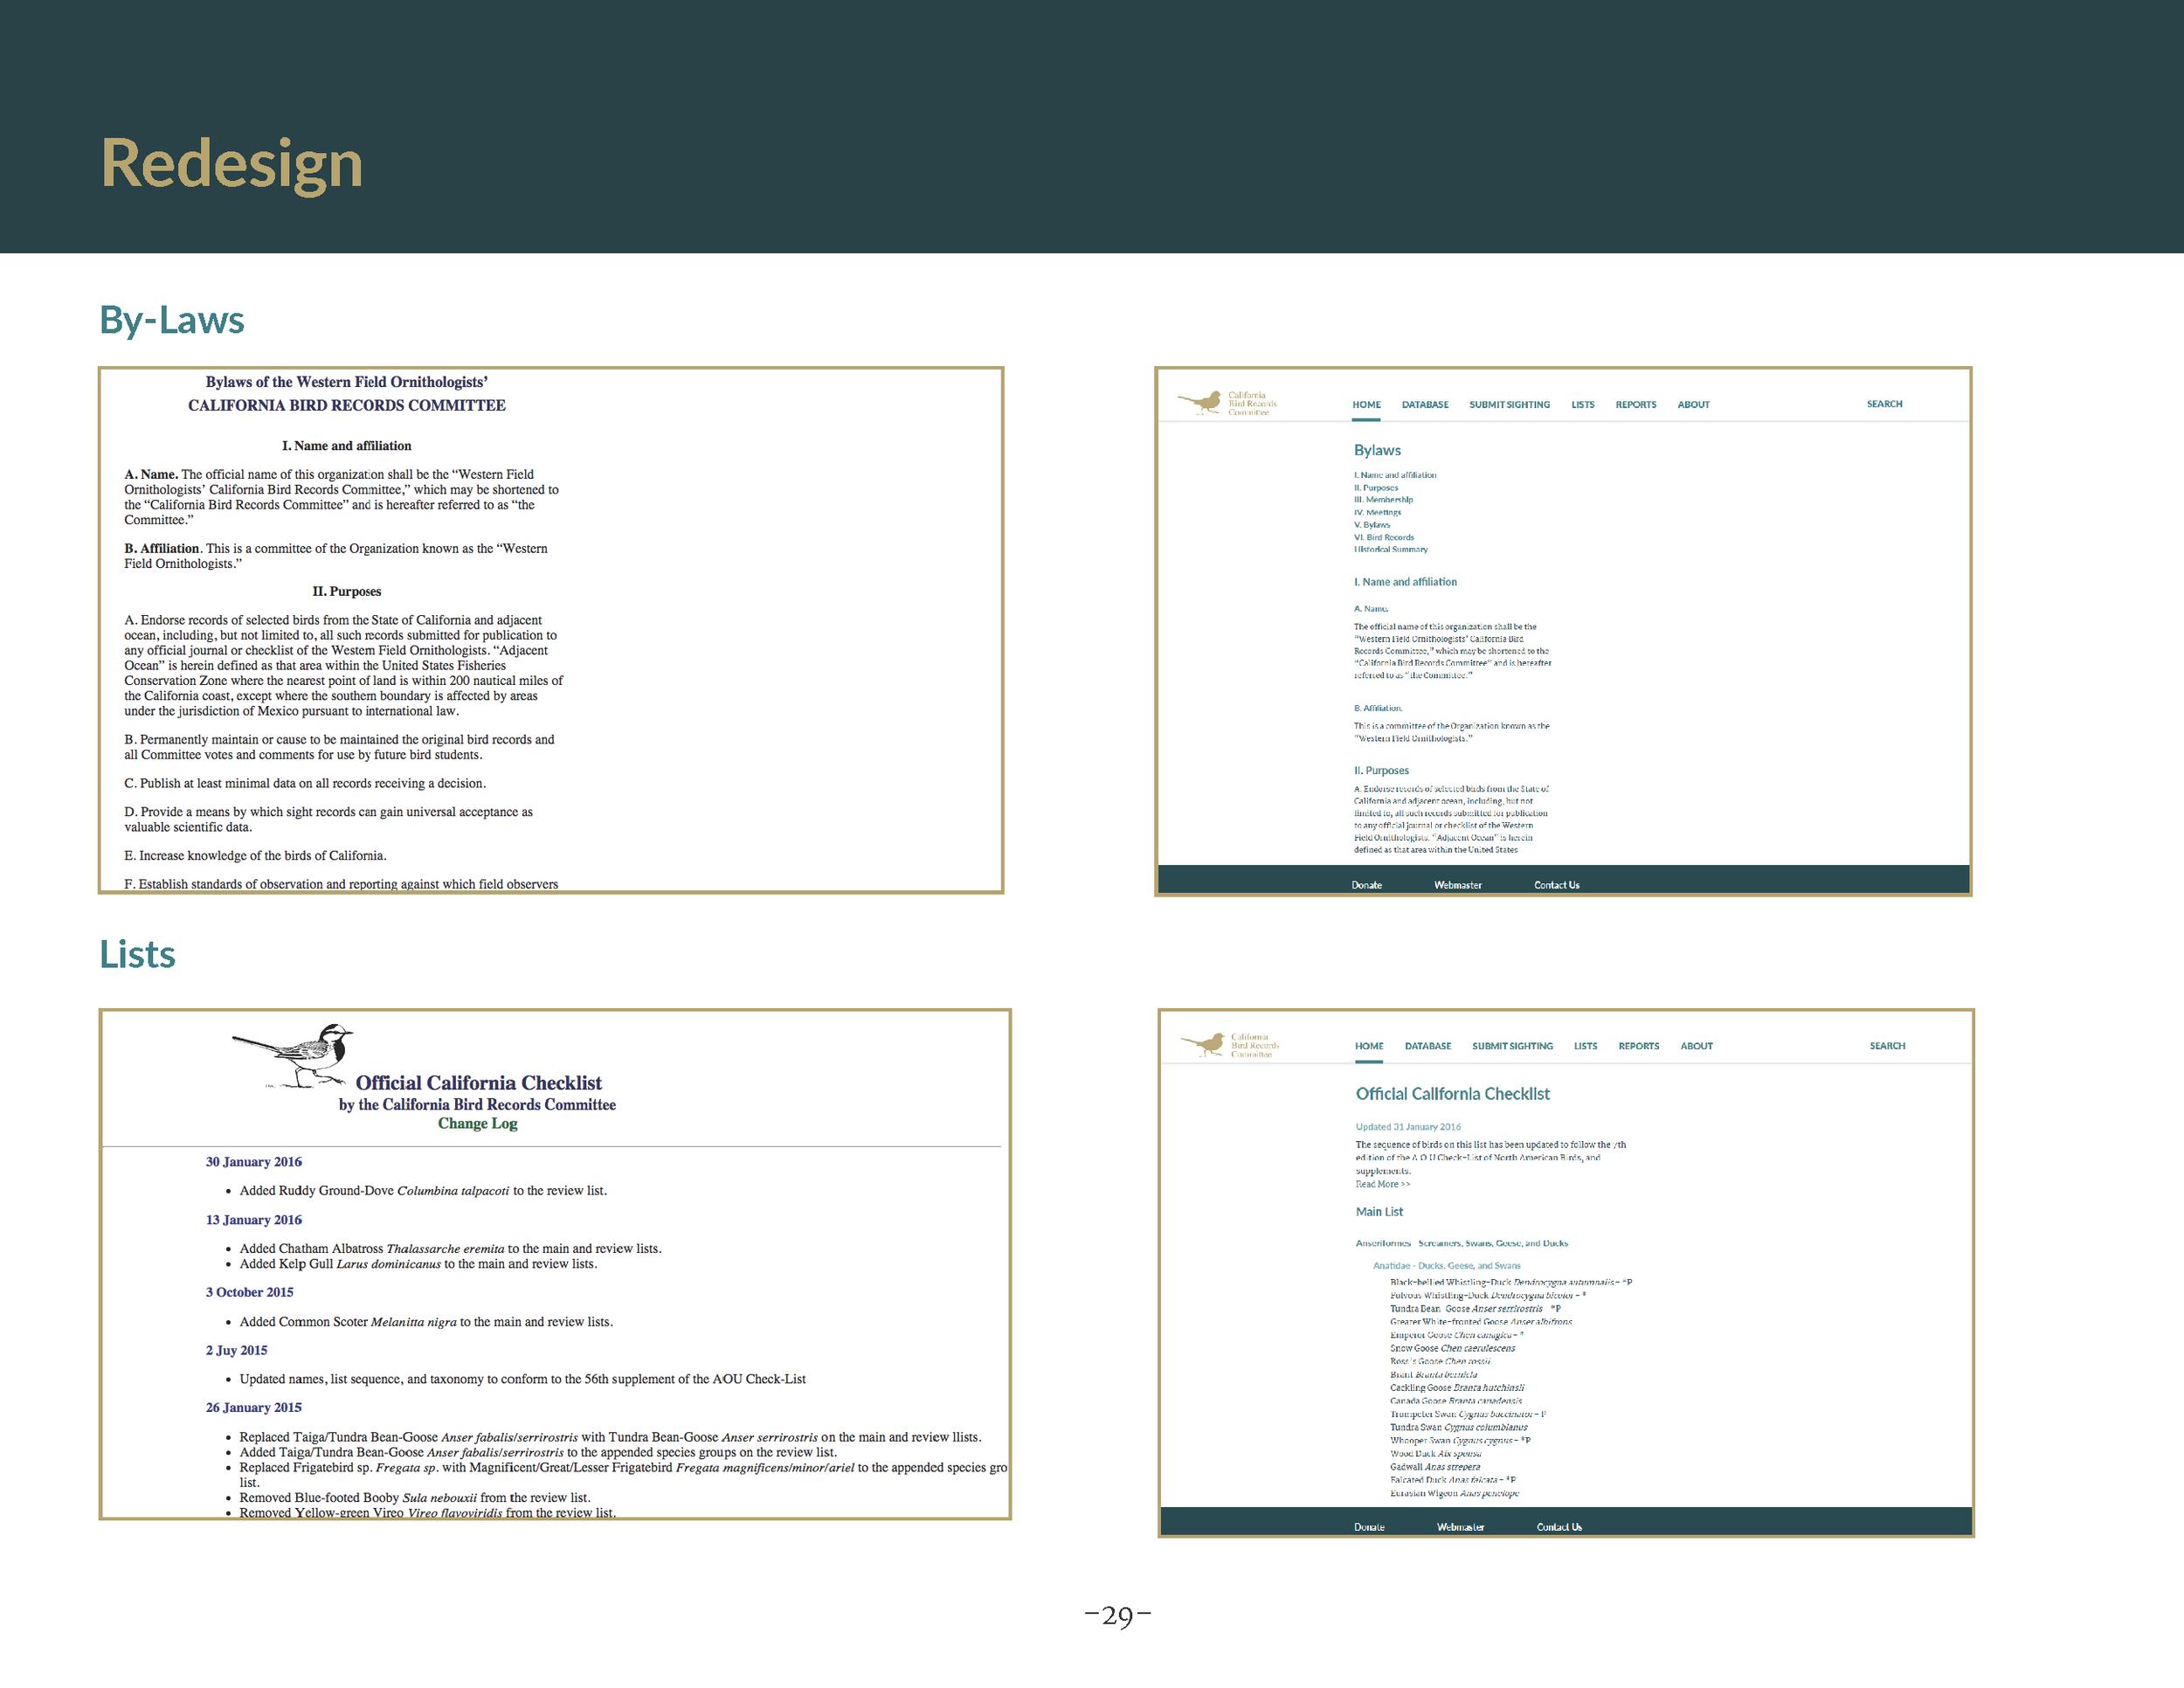 CBRC_ProcessV3_Page_29.png